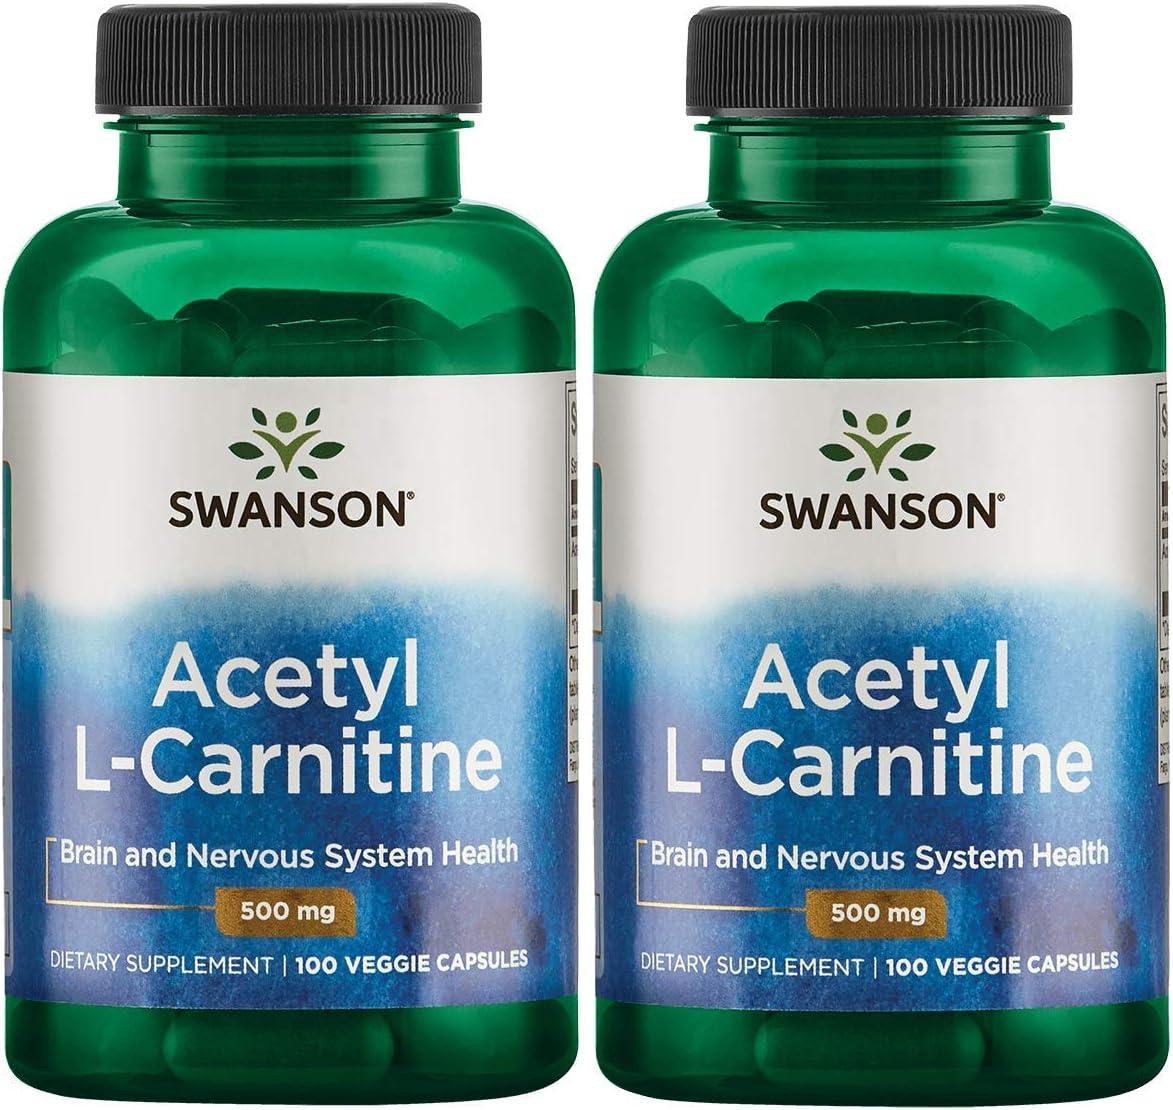 Swanson Acetyl L-Carnitine 500 Milligrams 100 Veg Capsules 2 Pack